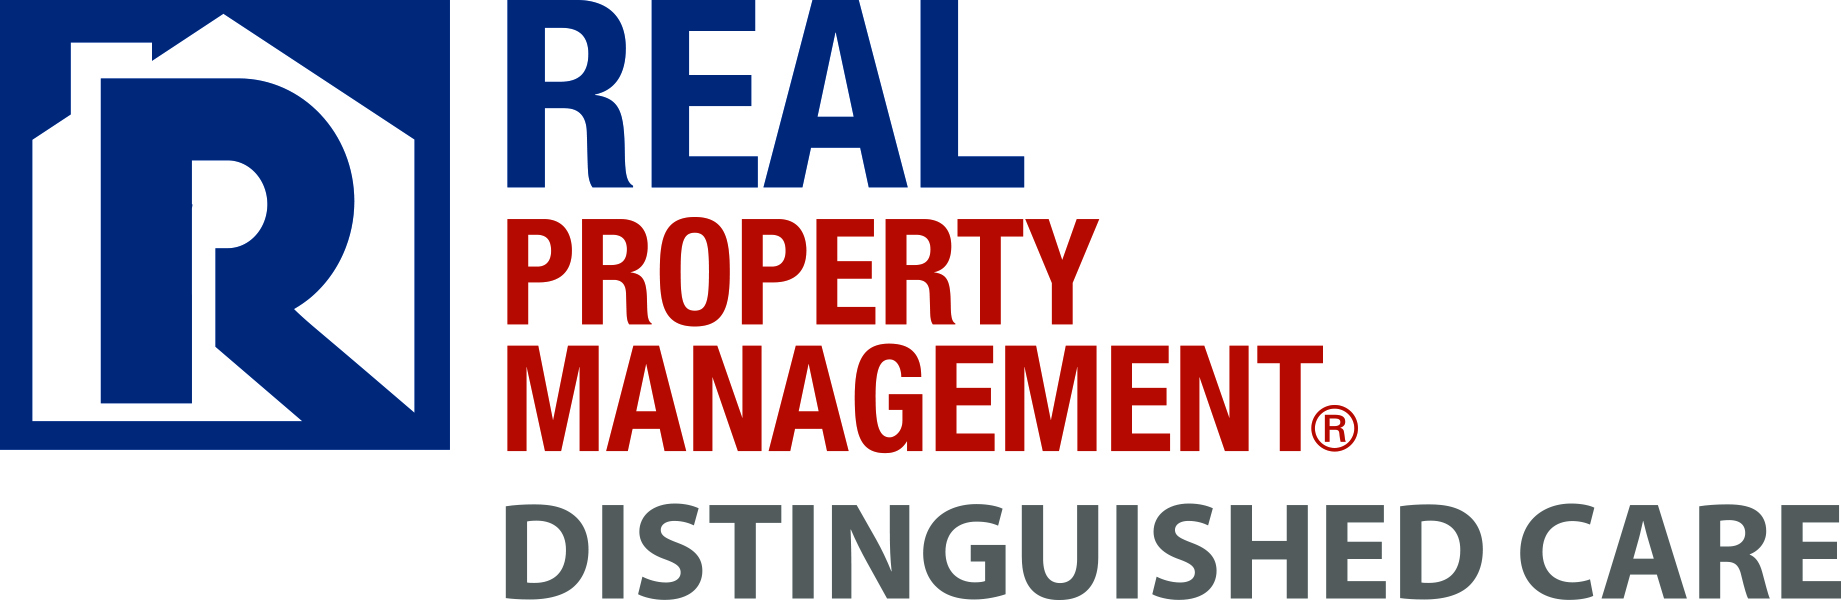 Real Property Management Distinguished Care